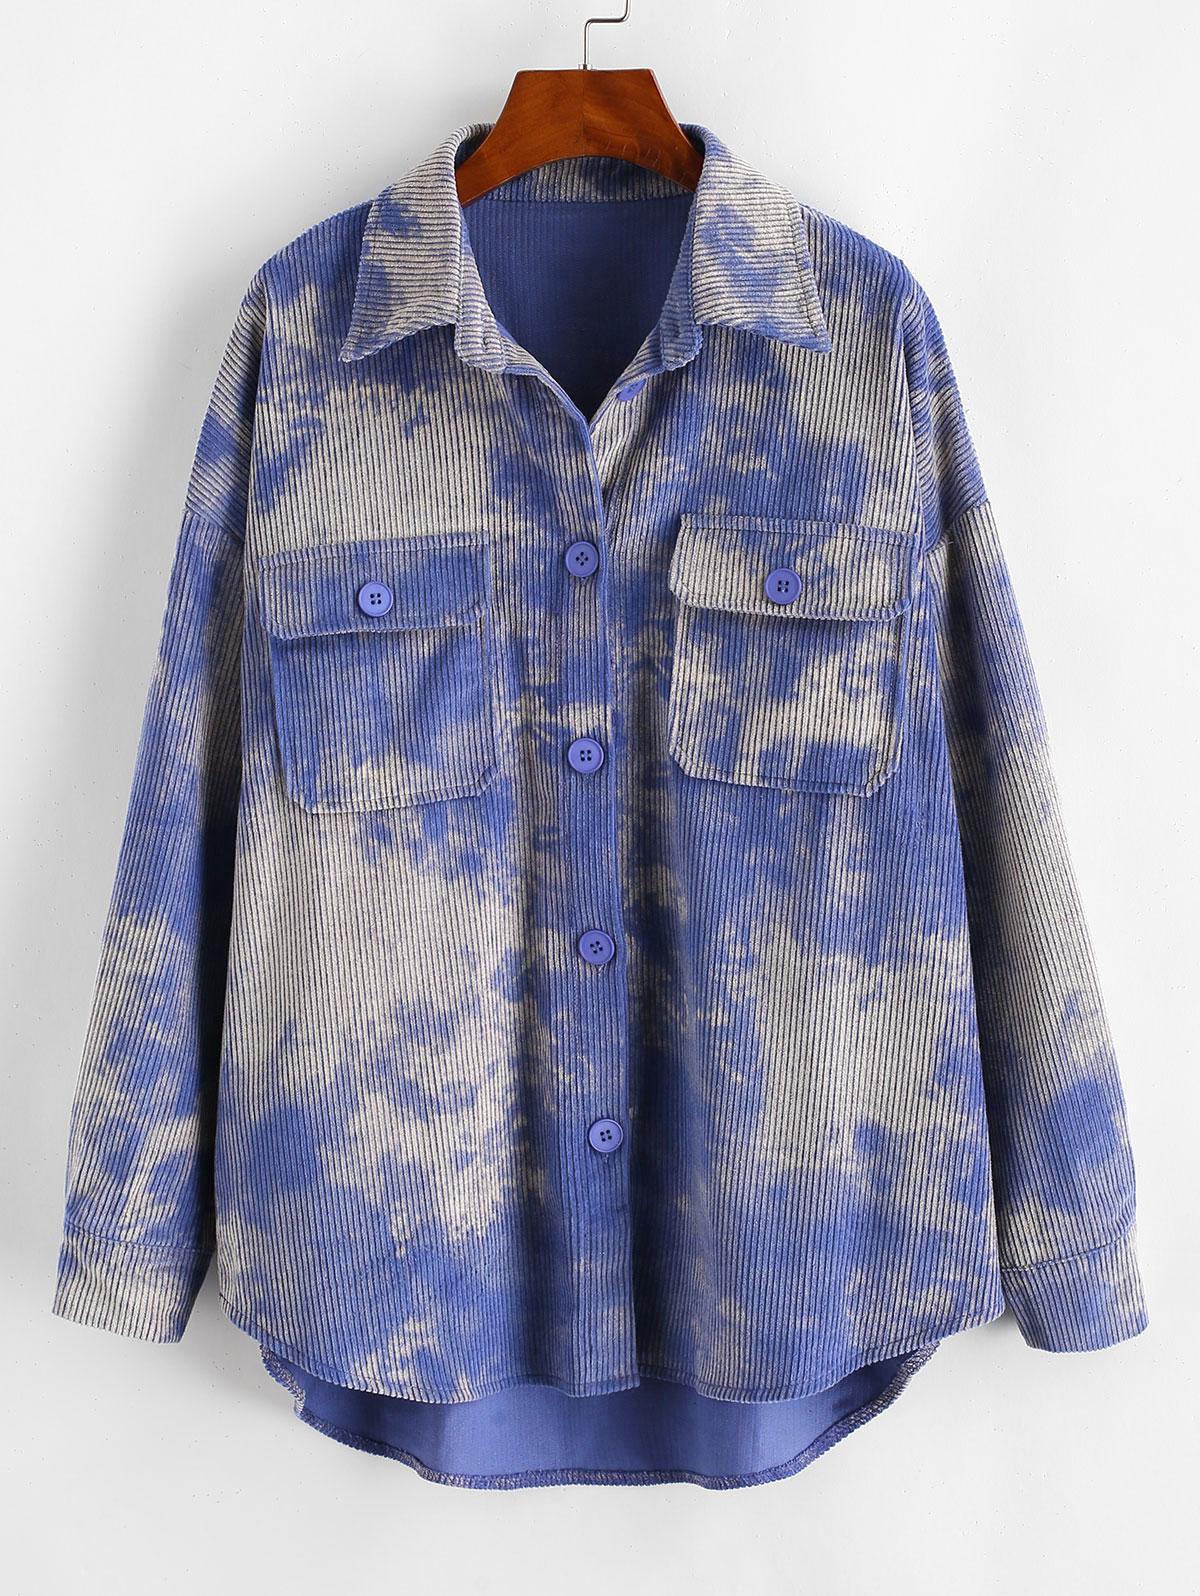 Tie Dye Corduroy Shirt Jacket